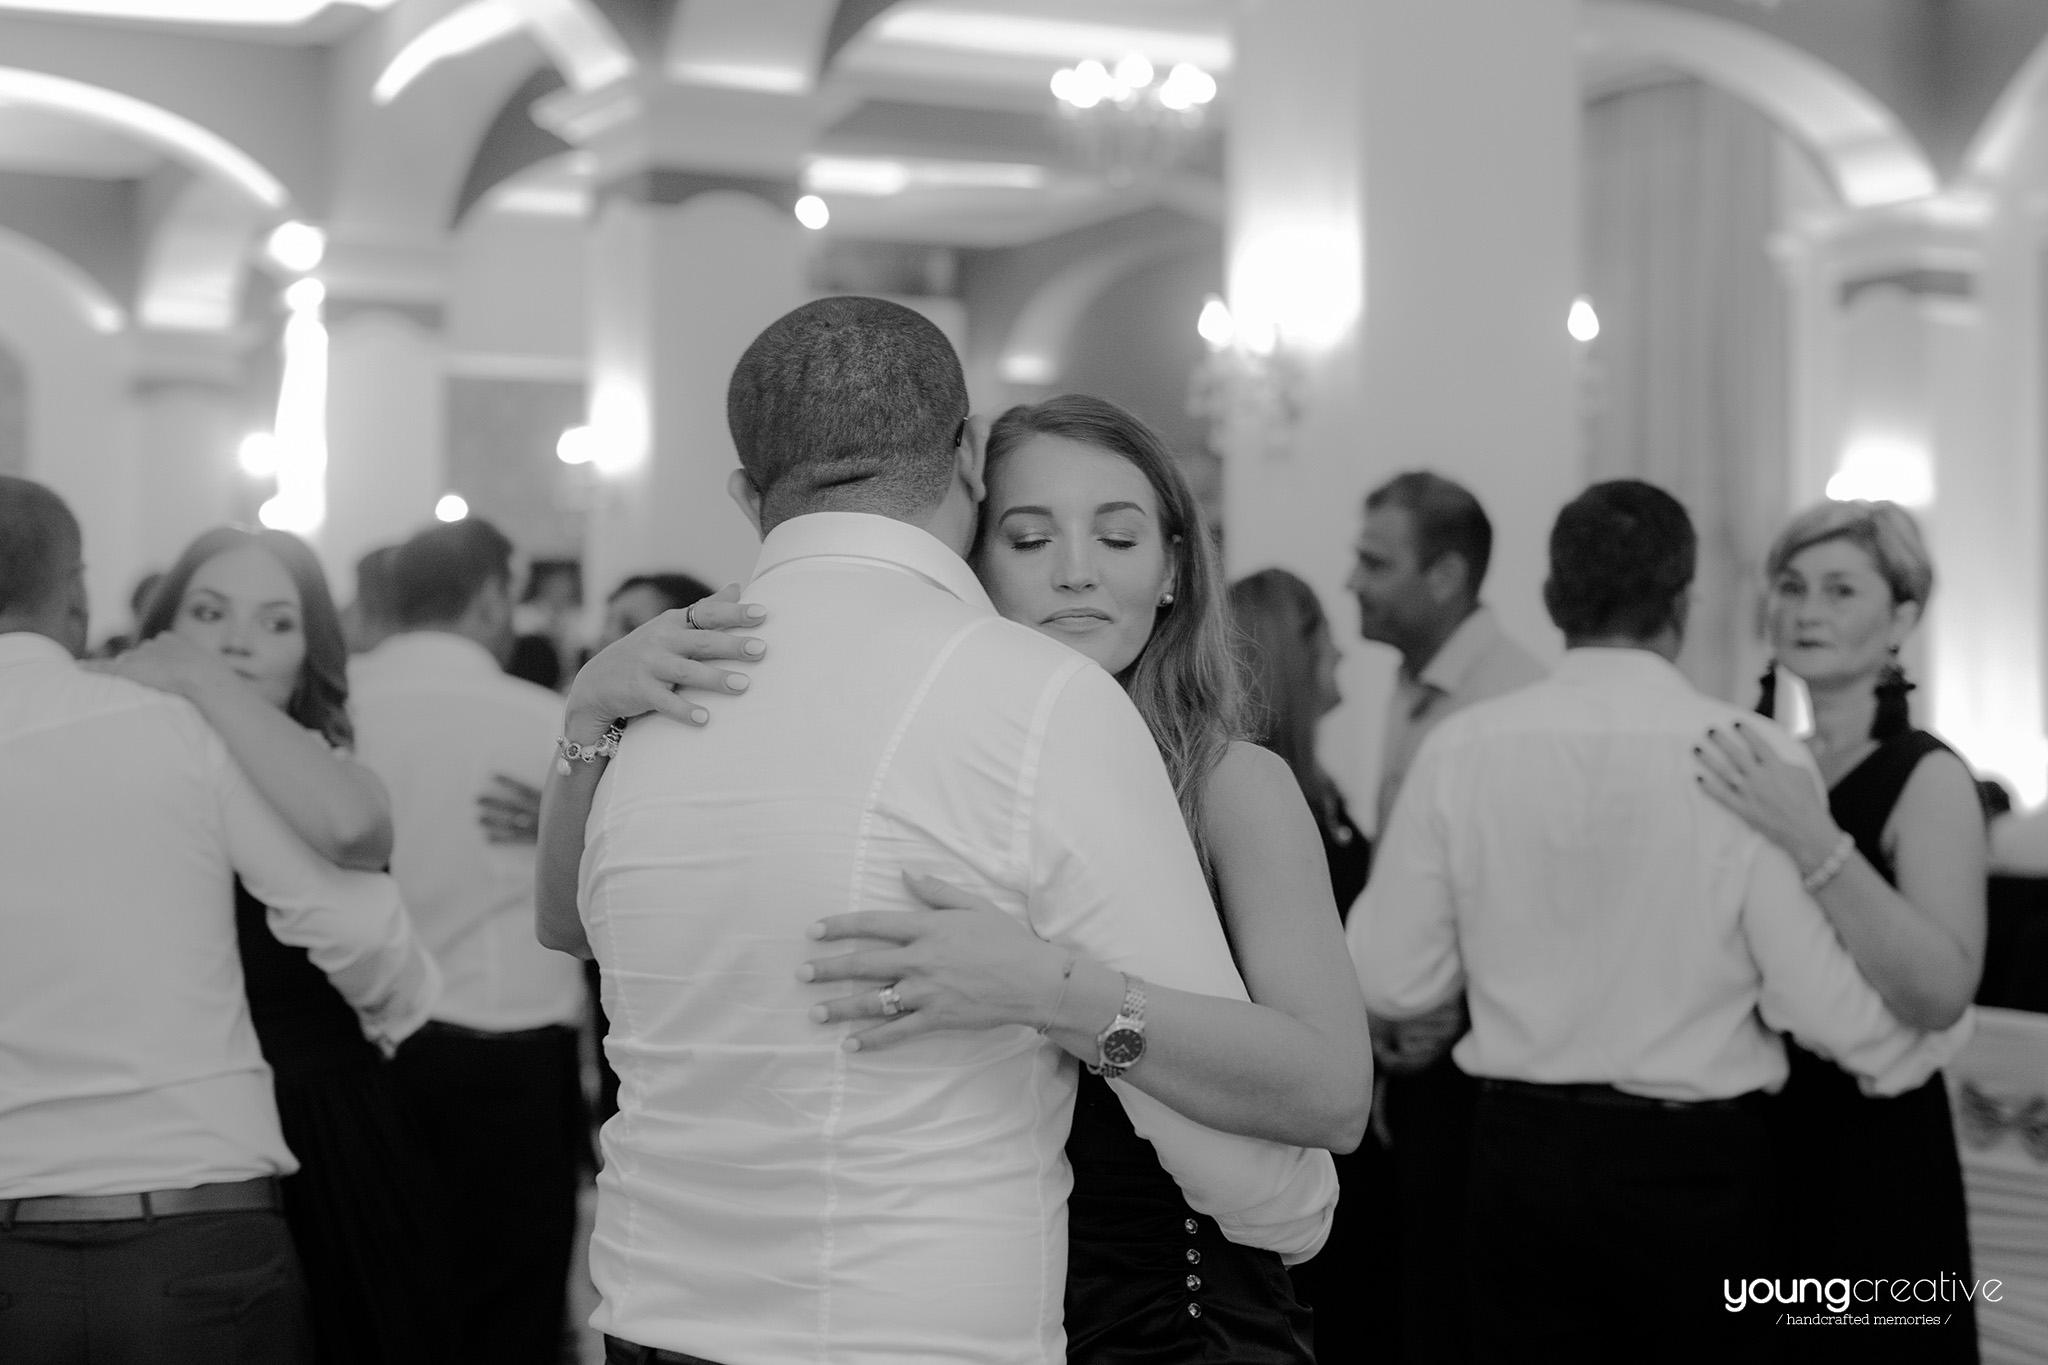 Petronela & Flavius | youngcreative.info media © Dan Filipciuc, Cristina Bejan | fotografie nunta Falticeni